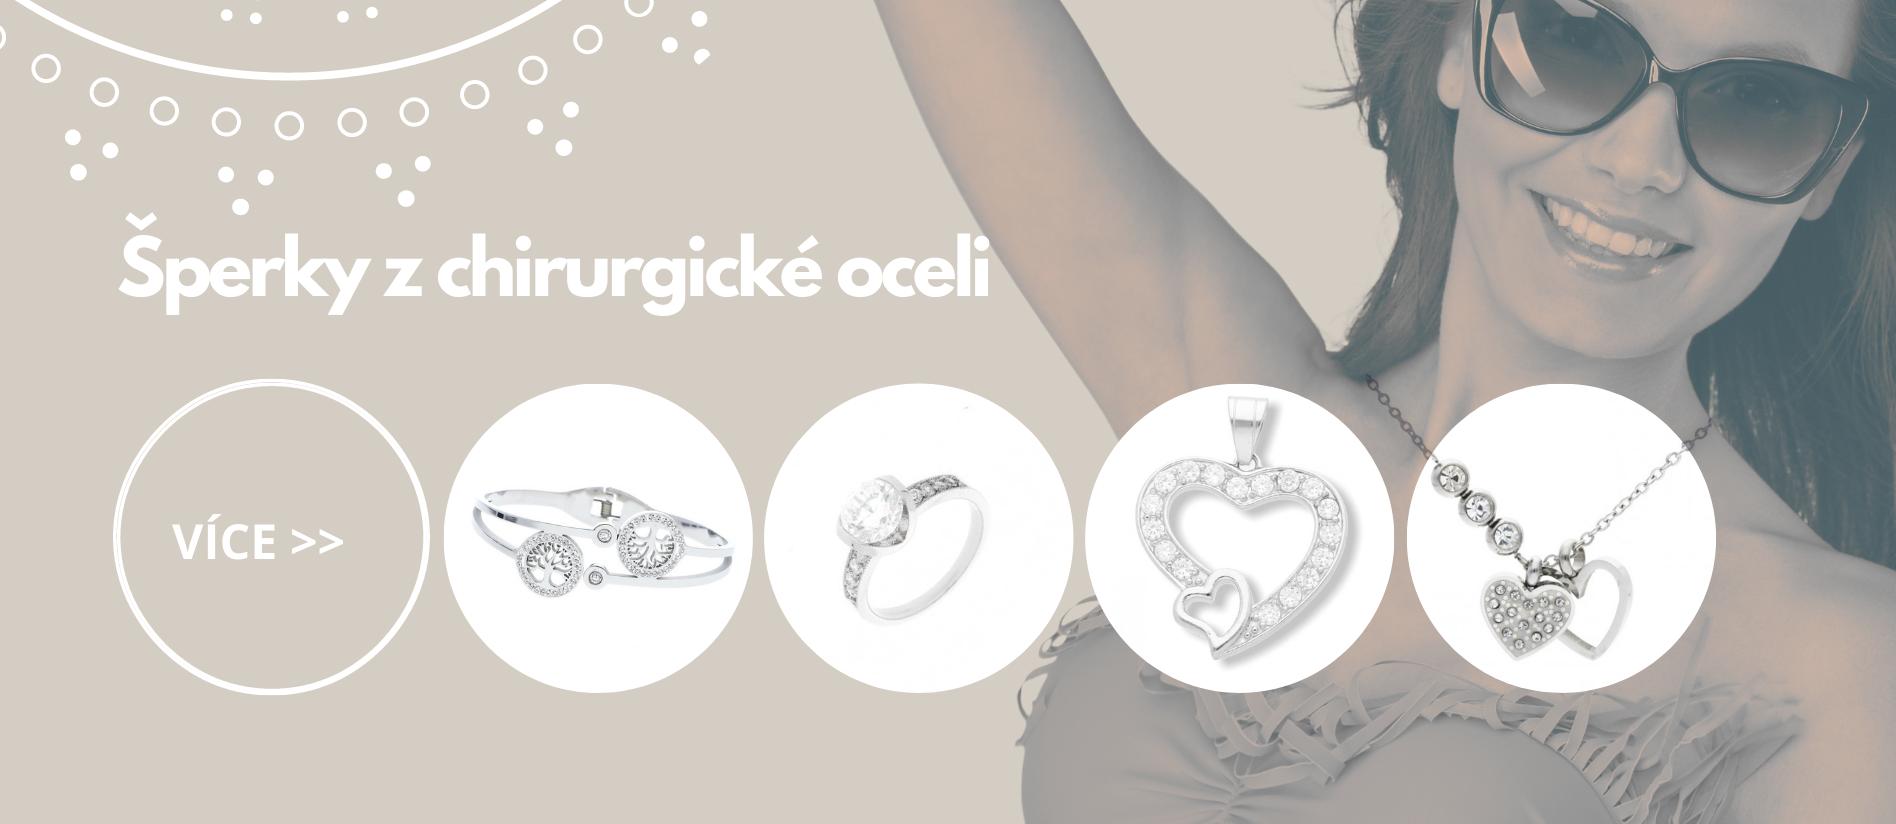 Šperky z chirurgické oceli